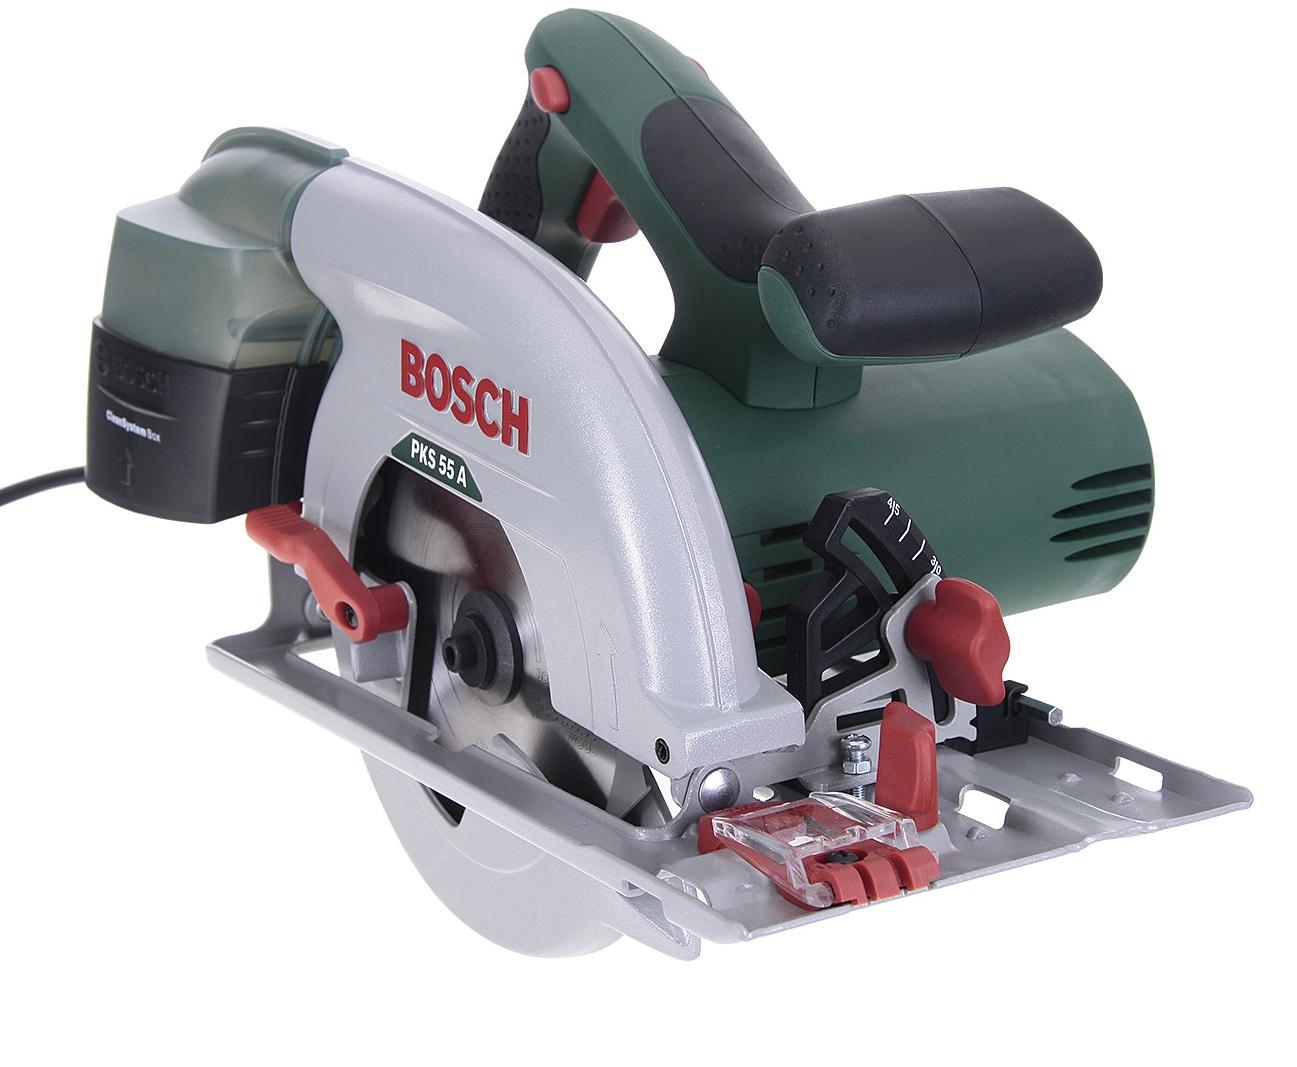 Пила циркулярная Bosch Pks 55 a (0.603.501.020) пила bosch pks 66 a 0603502022